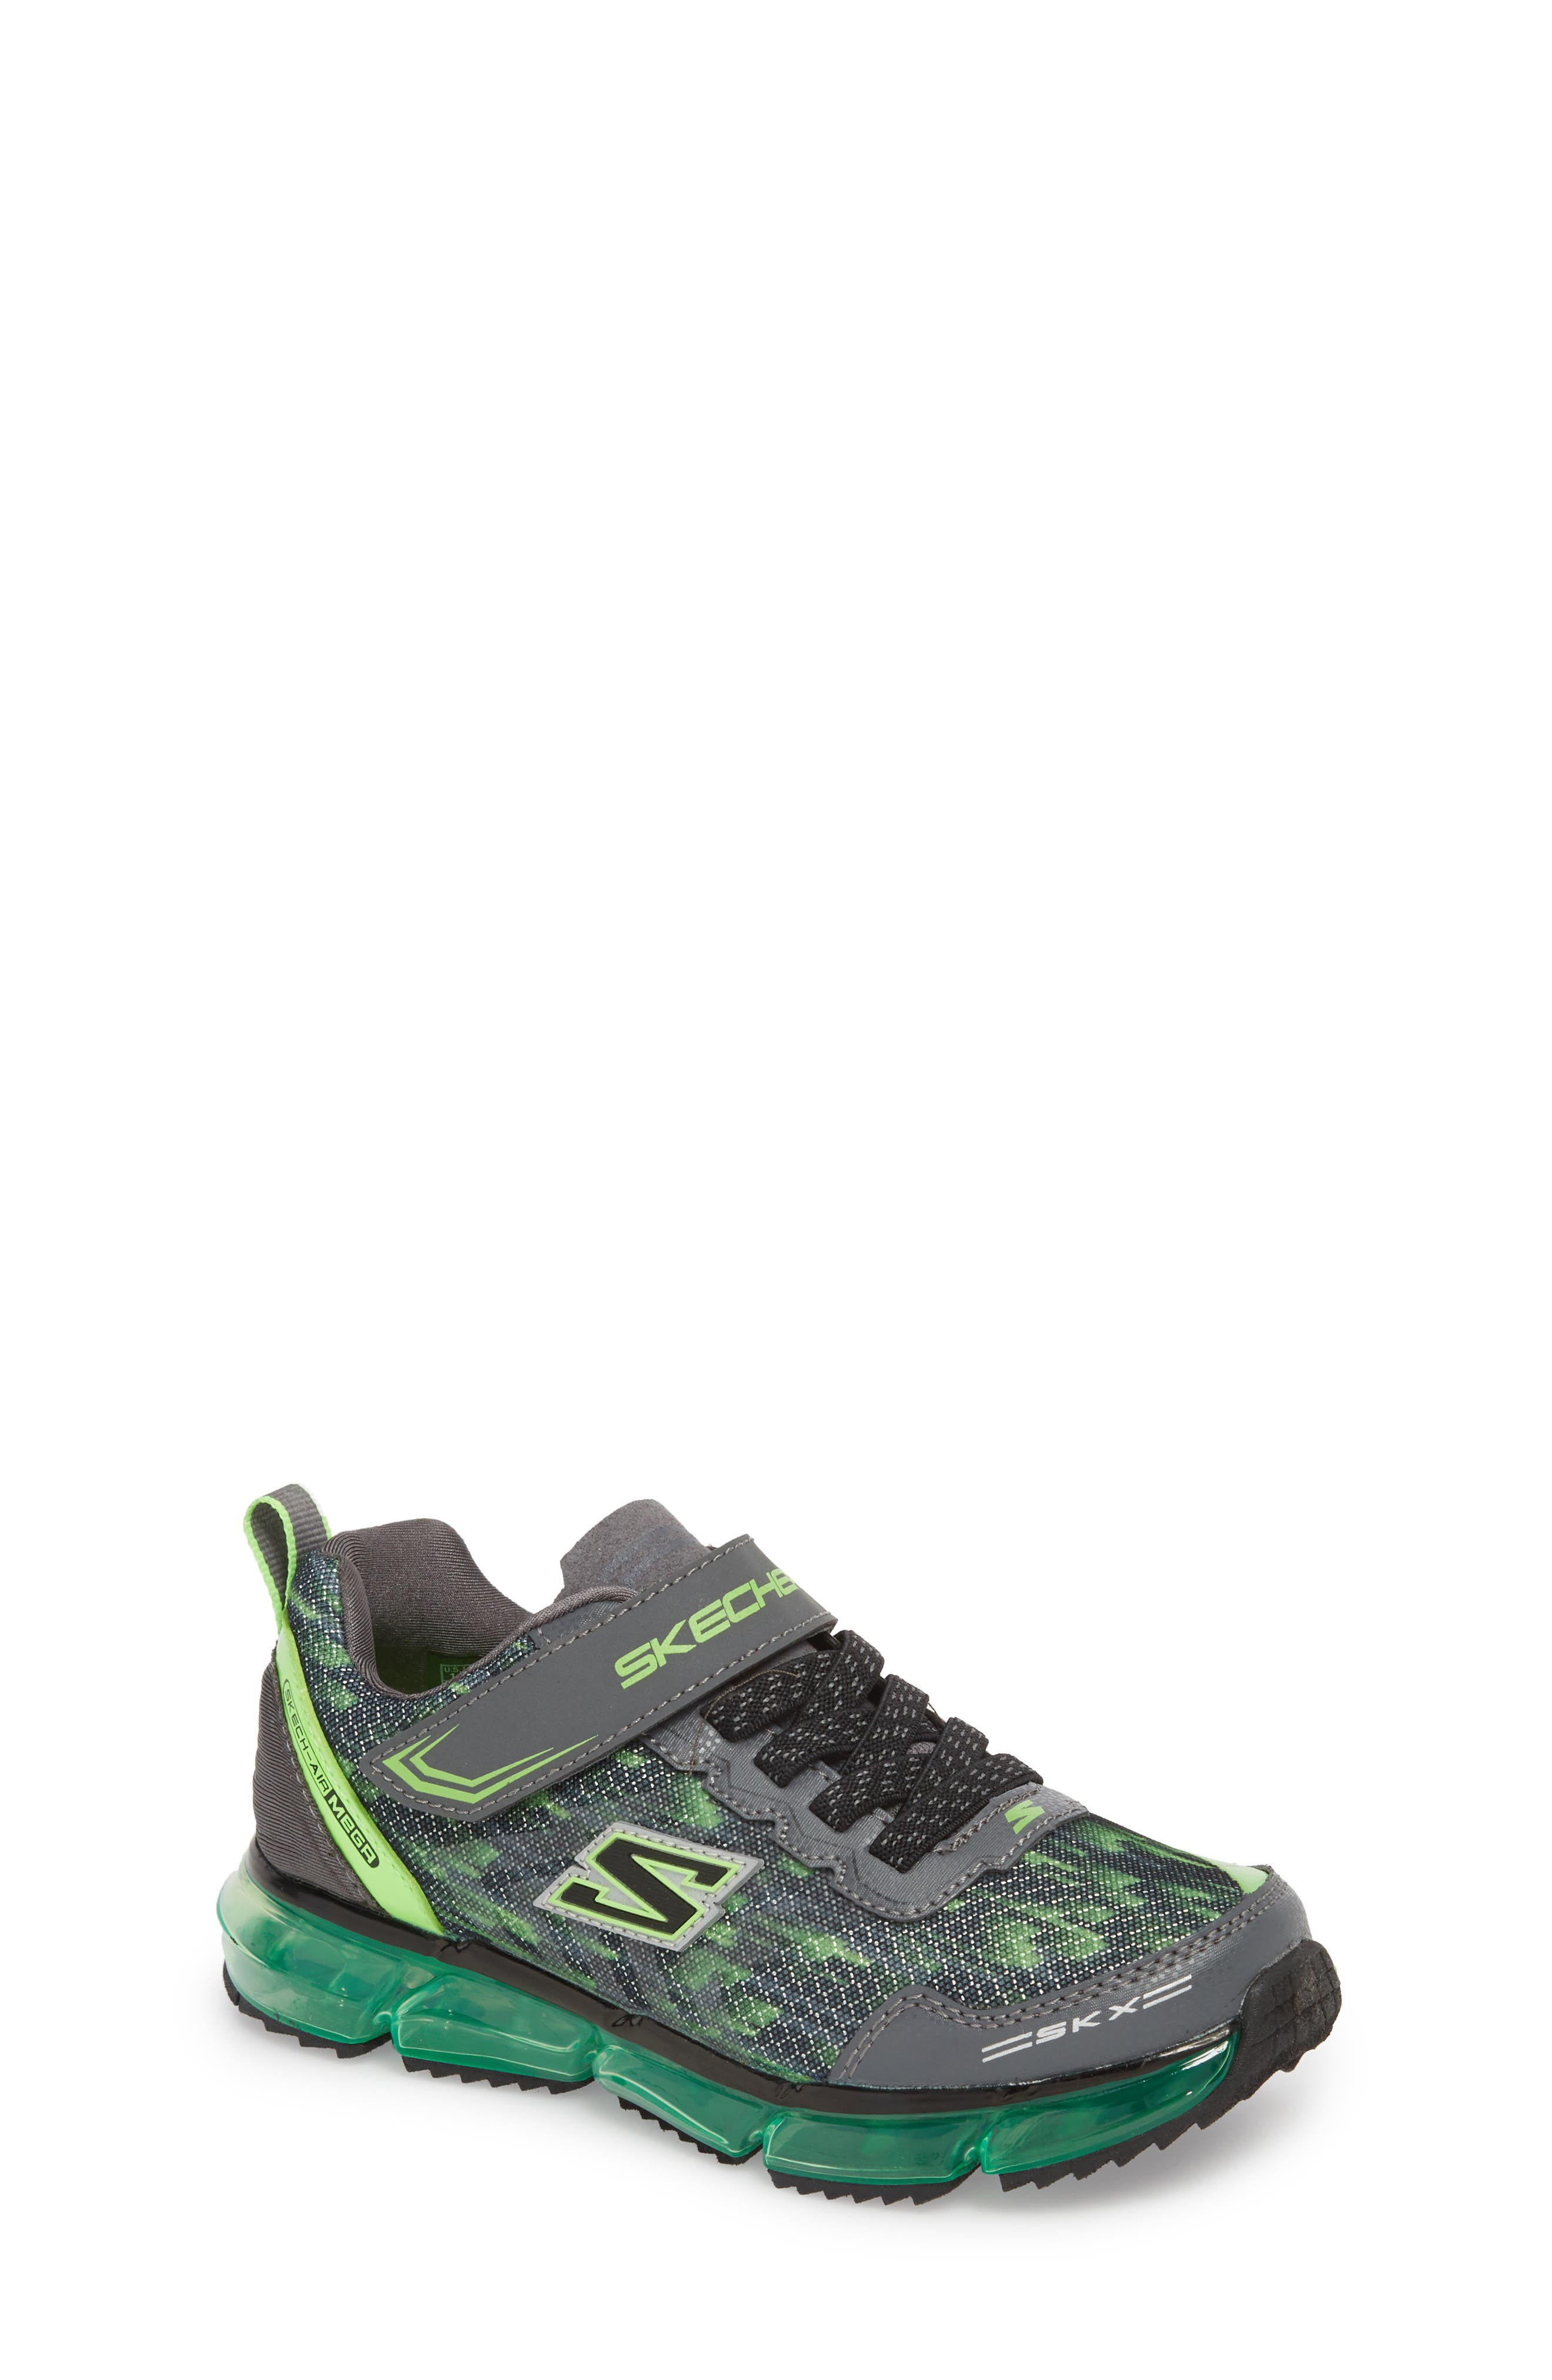 Skech-Air Mega Sneaker,                             Main thumbnail 1, color,                             Black/ Charcoal/ Lime